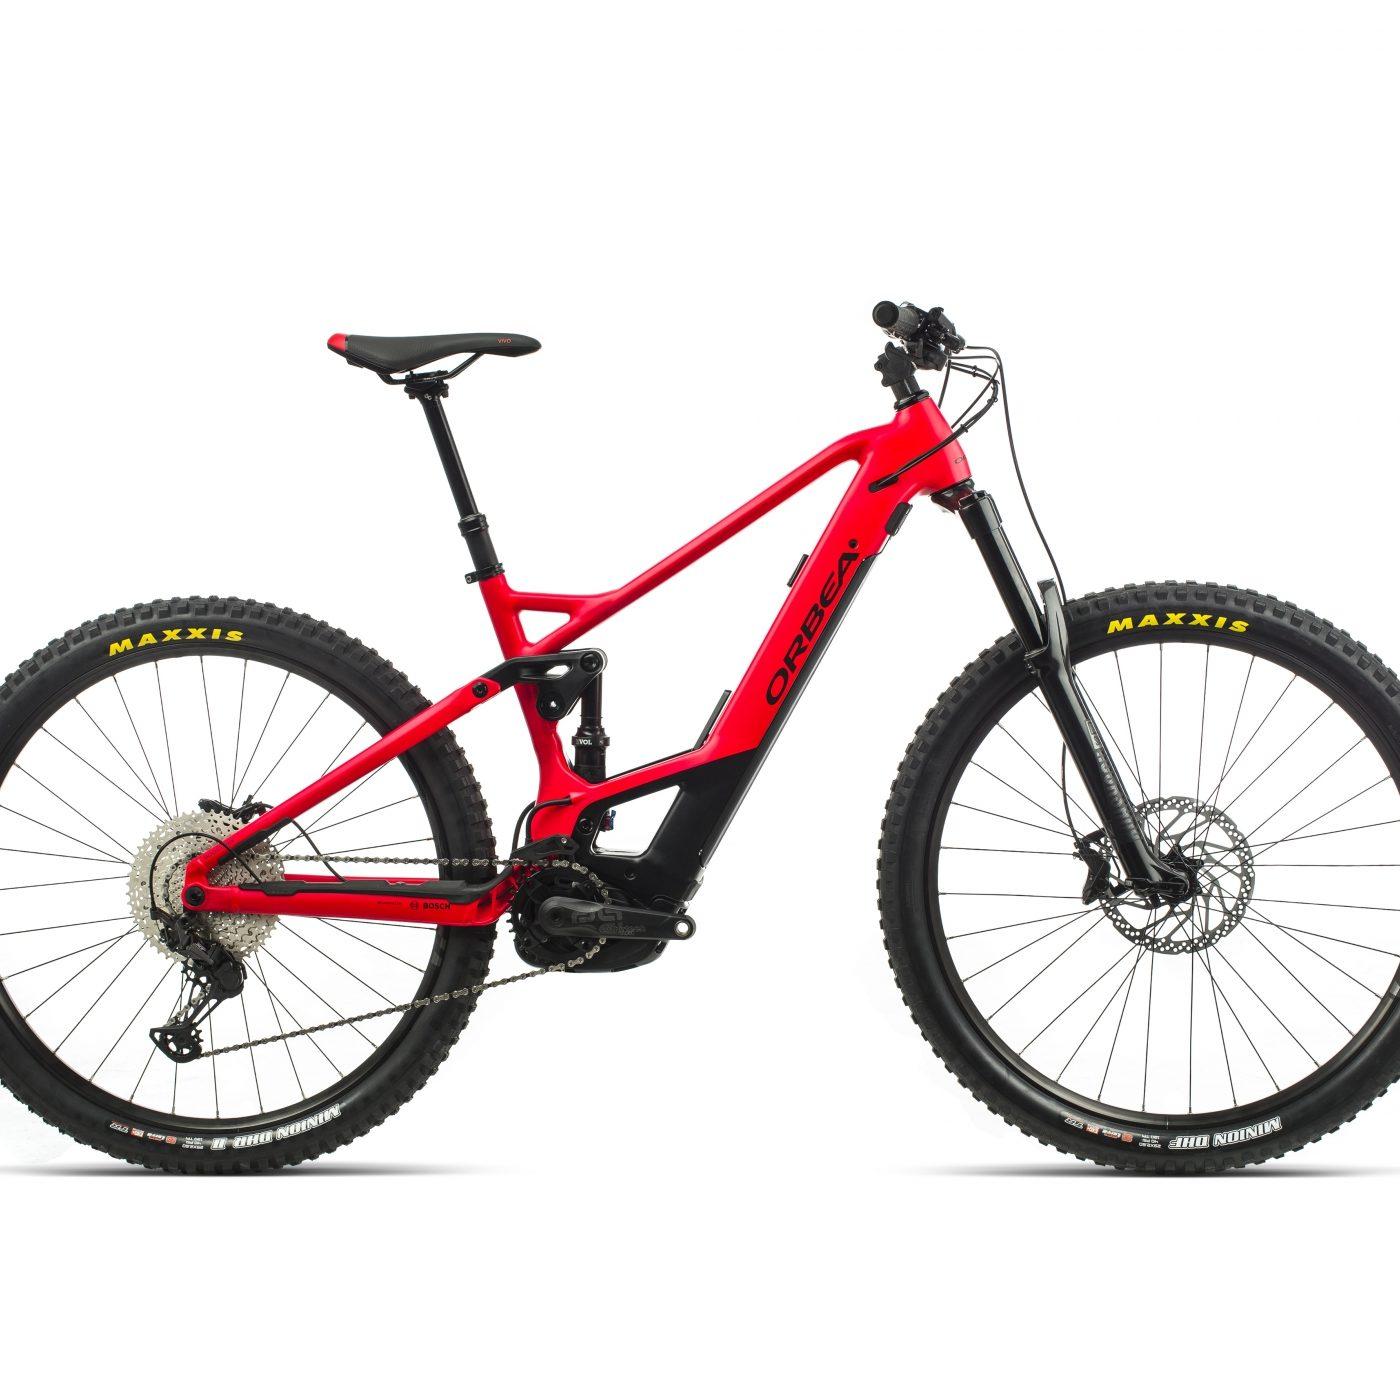 ORBEA WILD FS H25 eBike - BRIGHTRED /ZWART (DOF) @G-Bikes